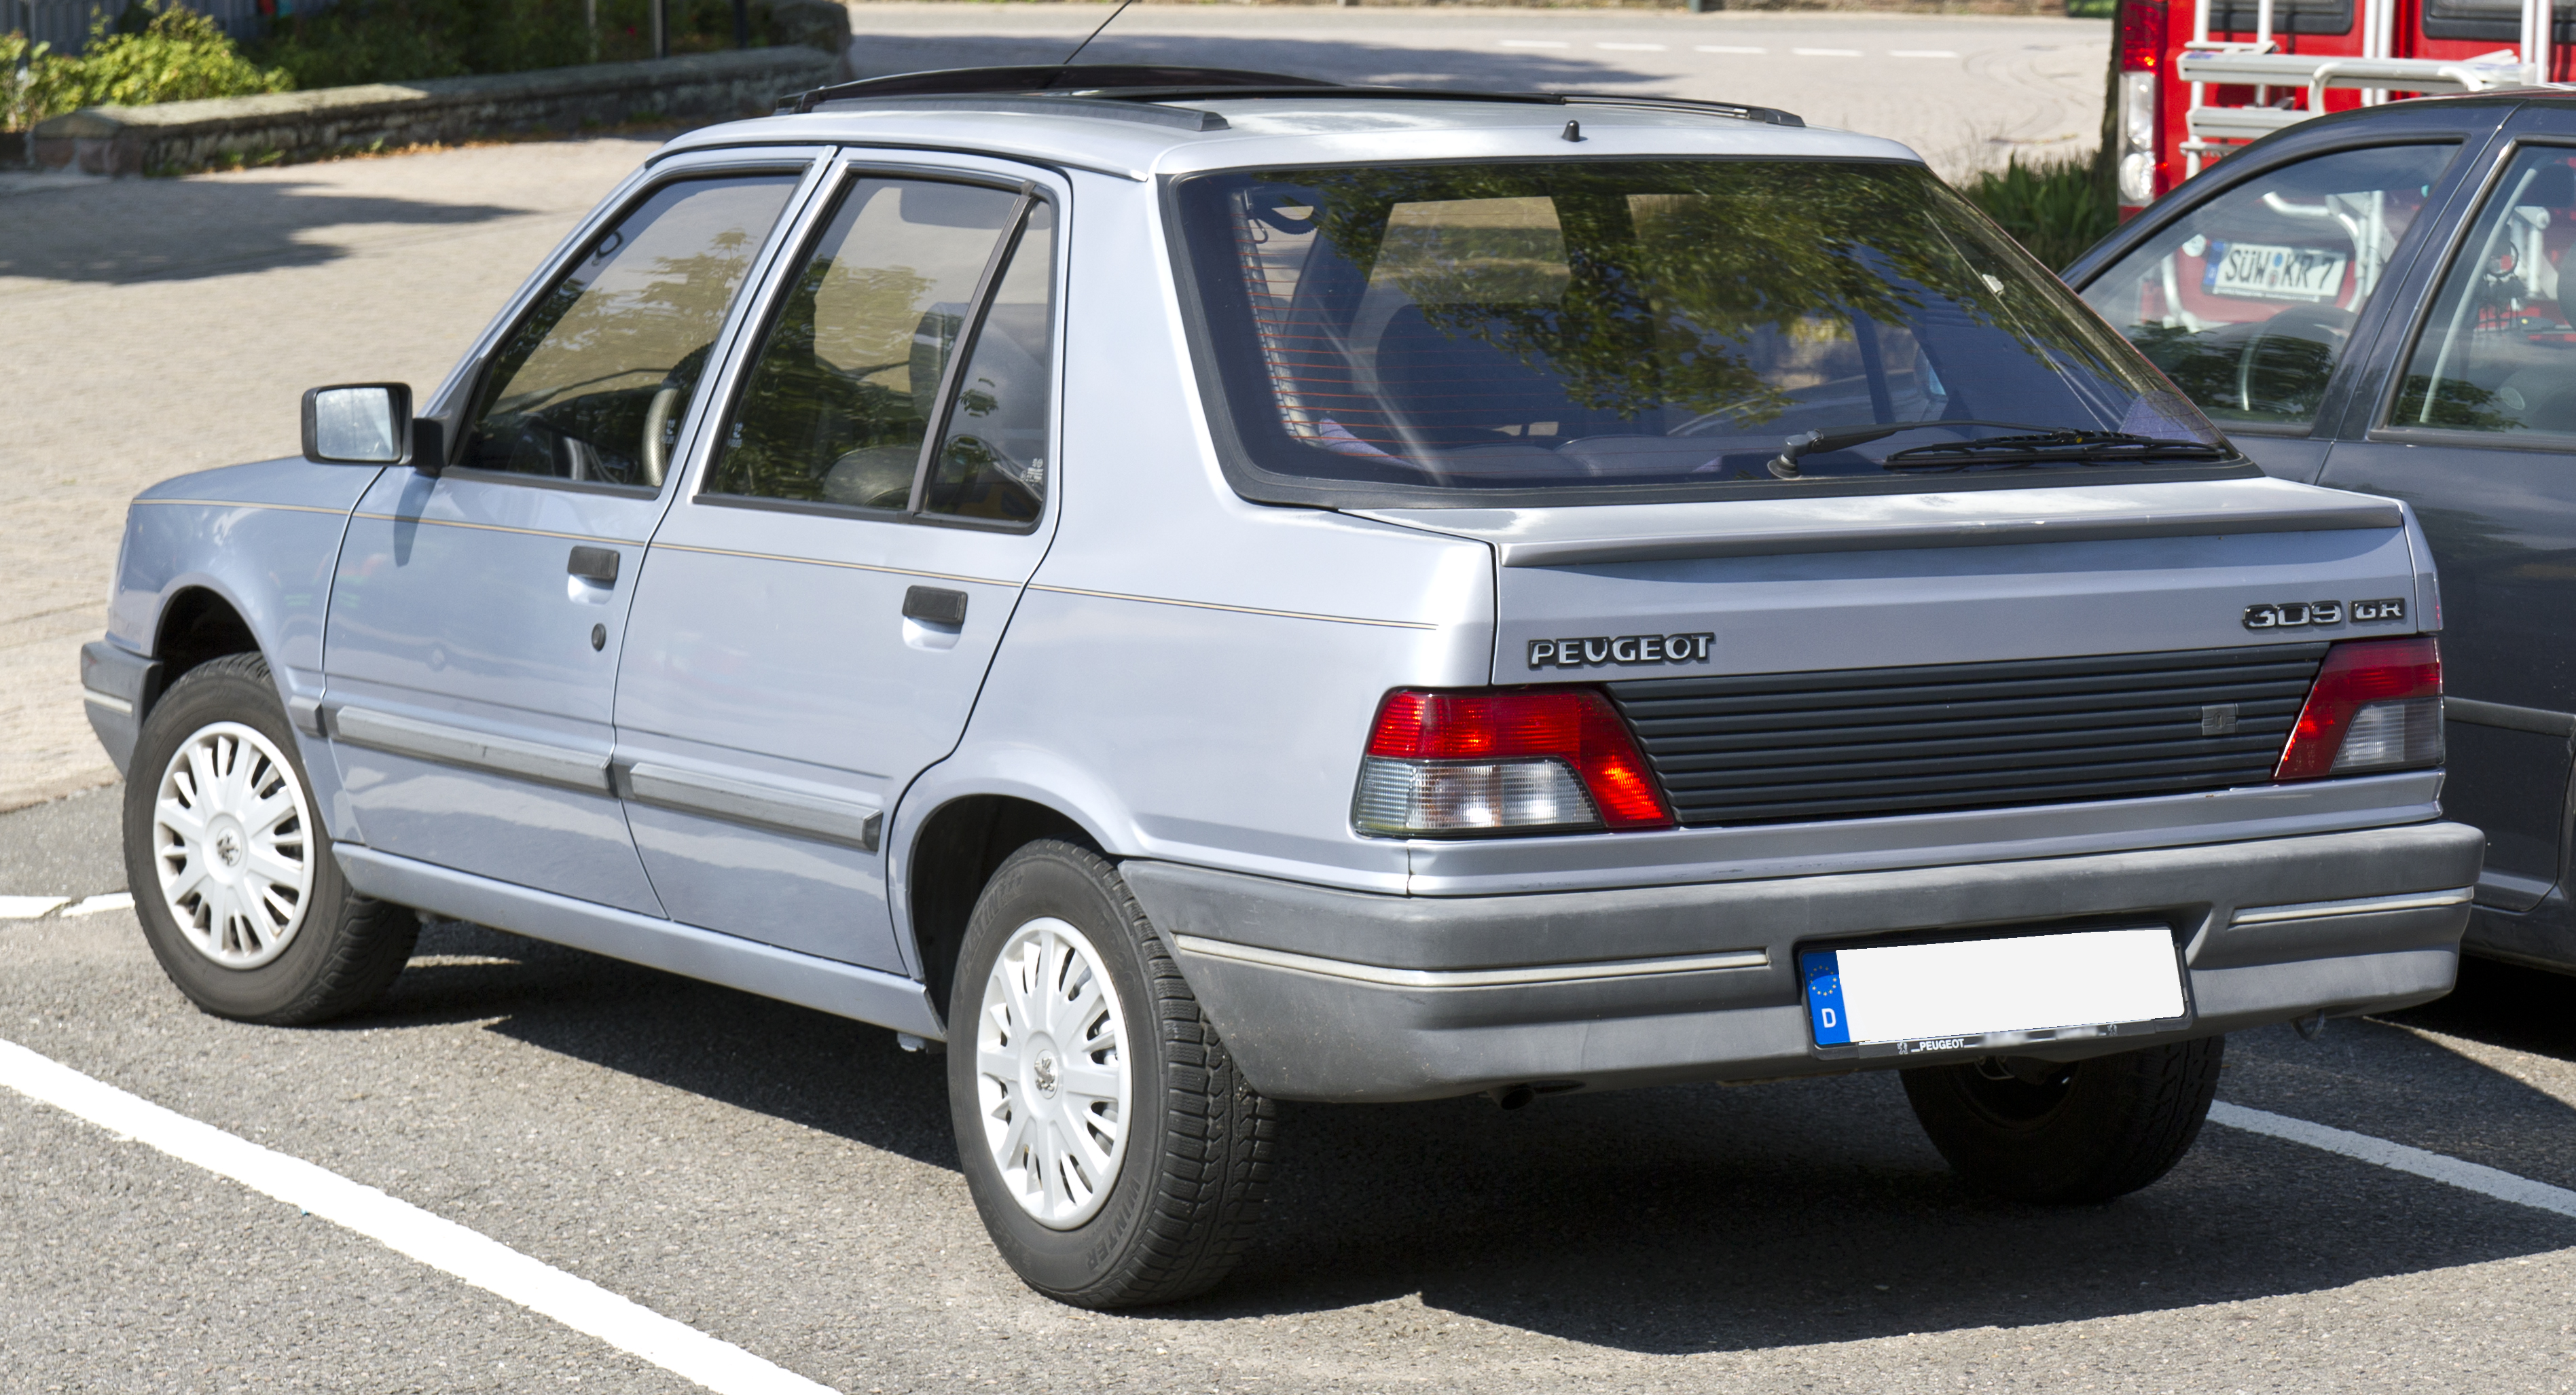 File:Peugeot 309 GR rear 20140731.jpg